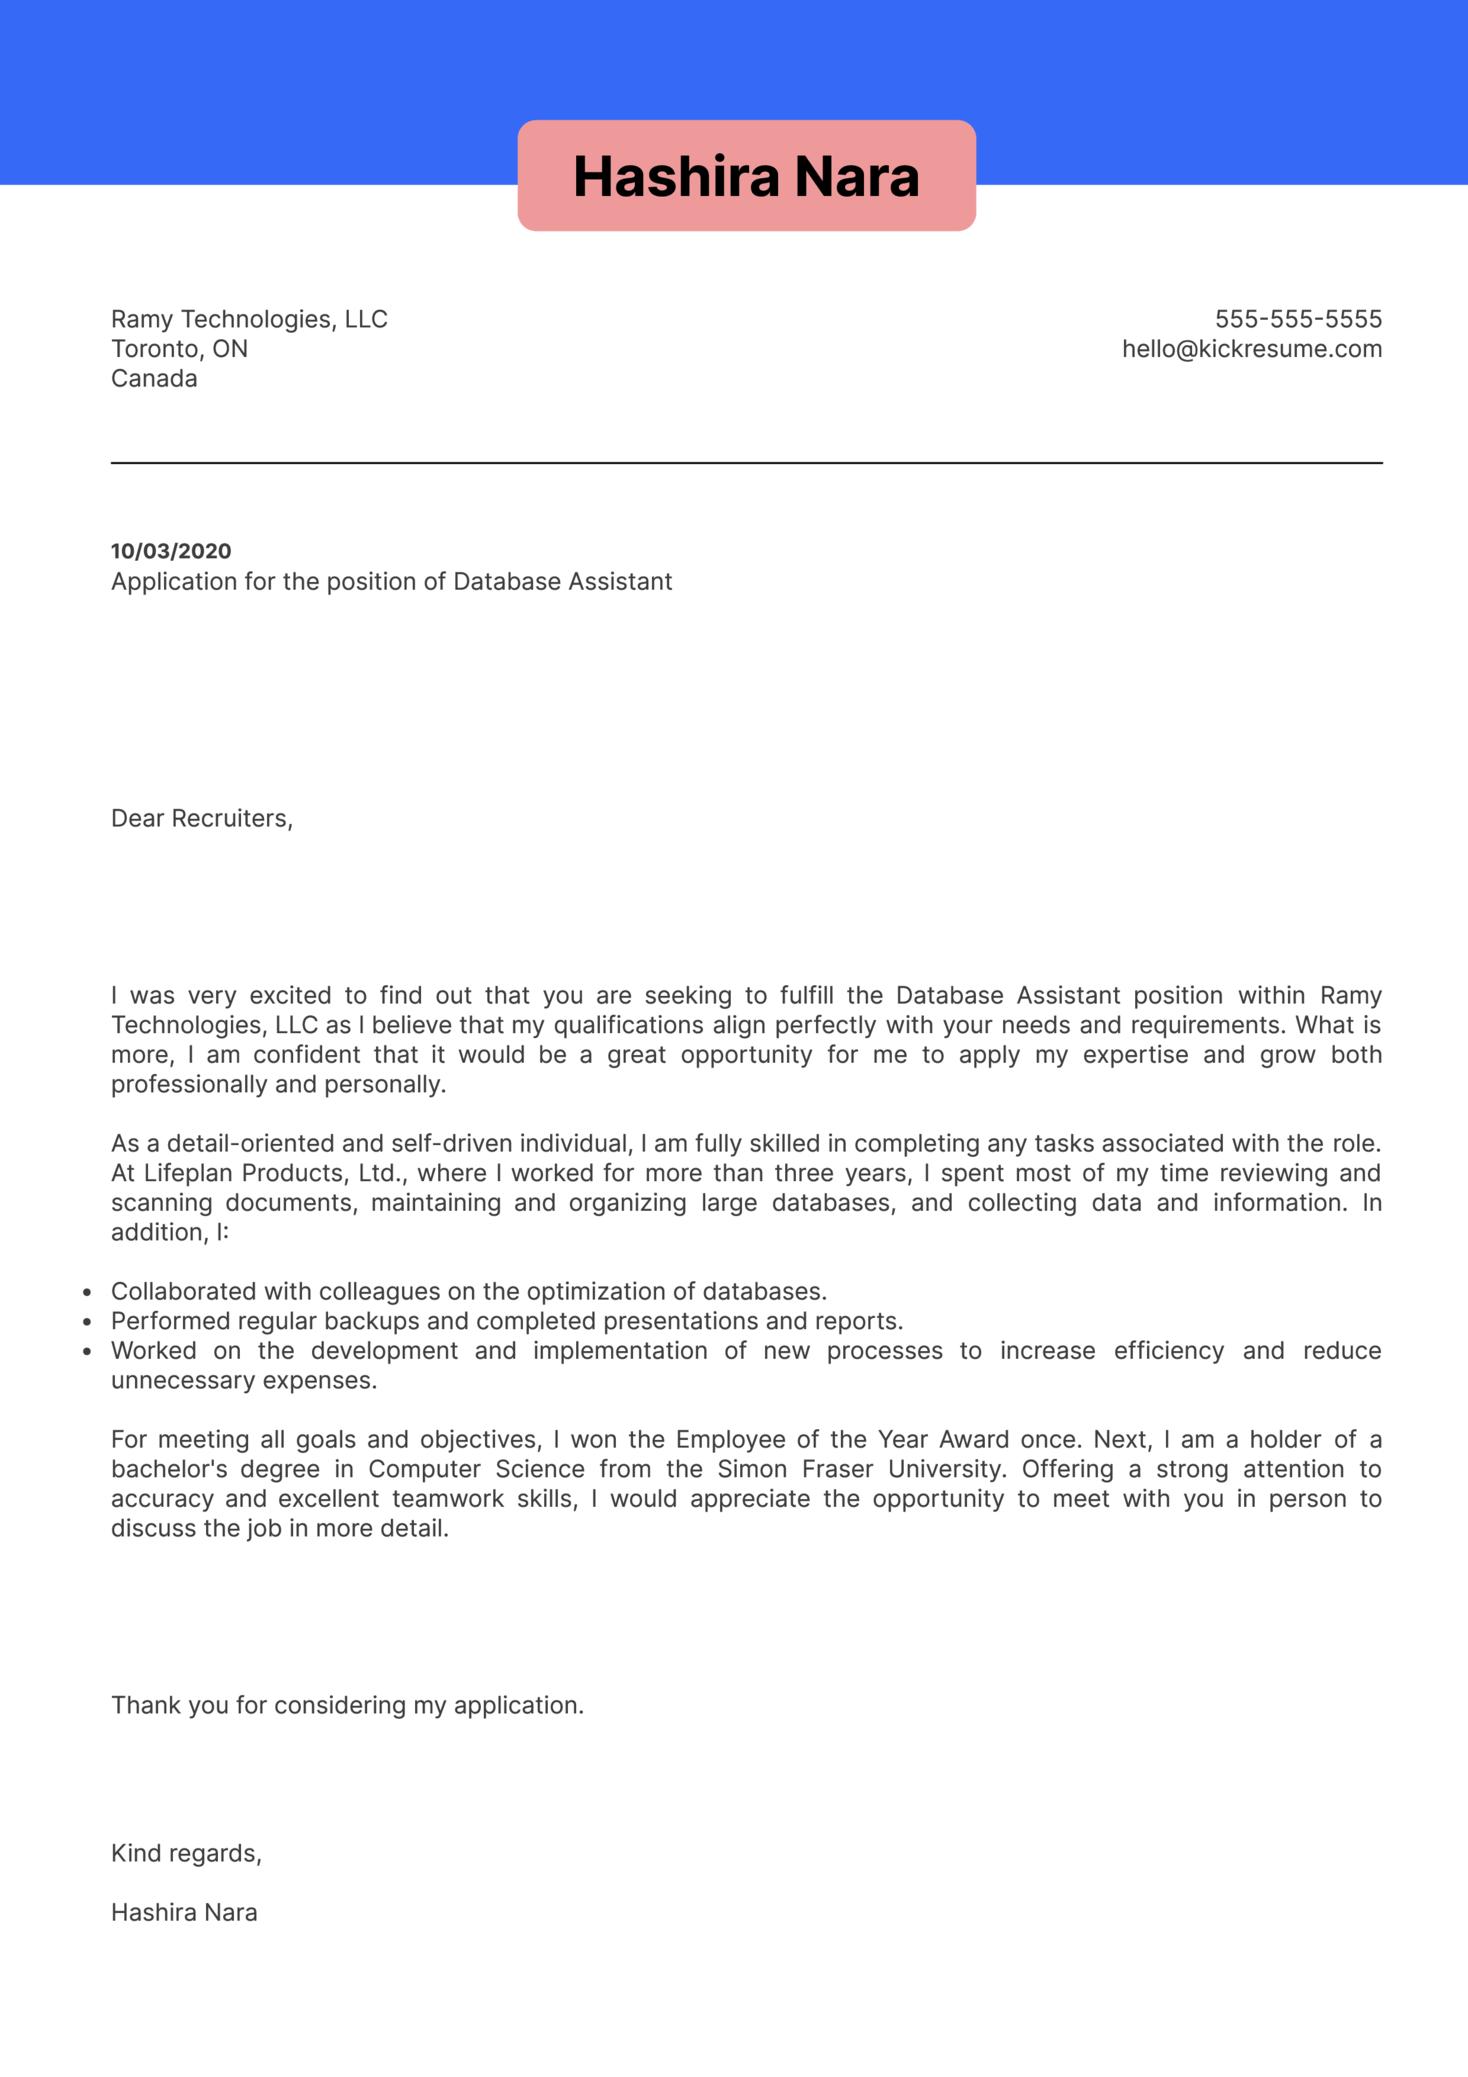 Database Assistant Cover Letter Sample